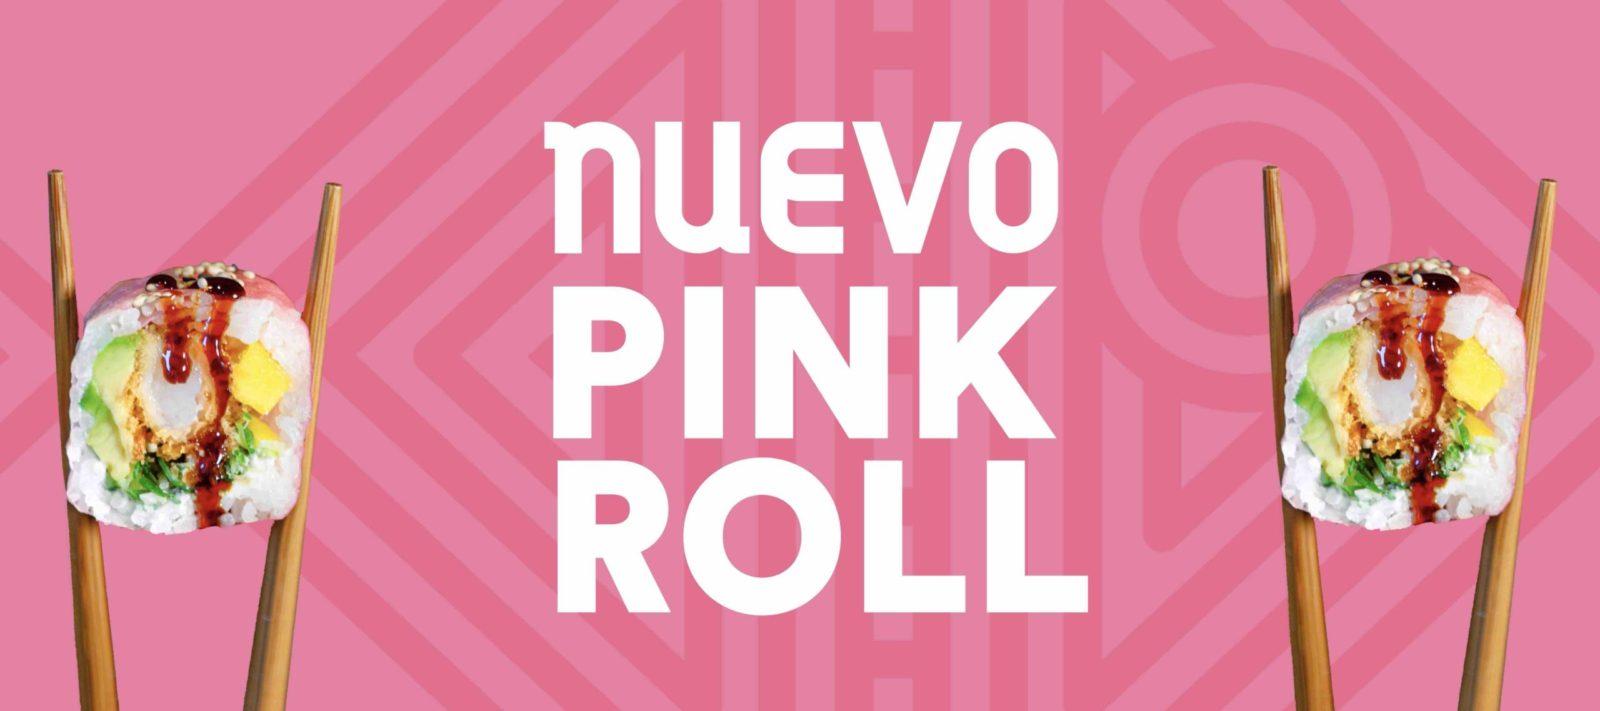 nuevo pink roll